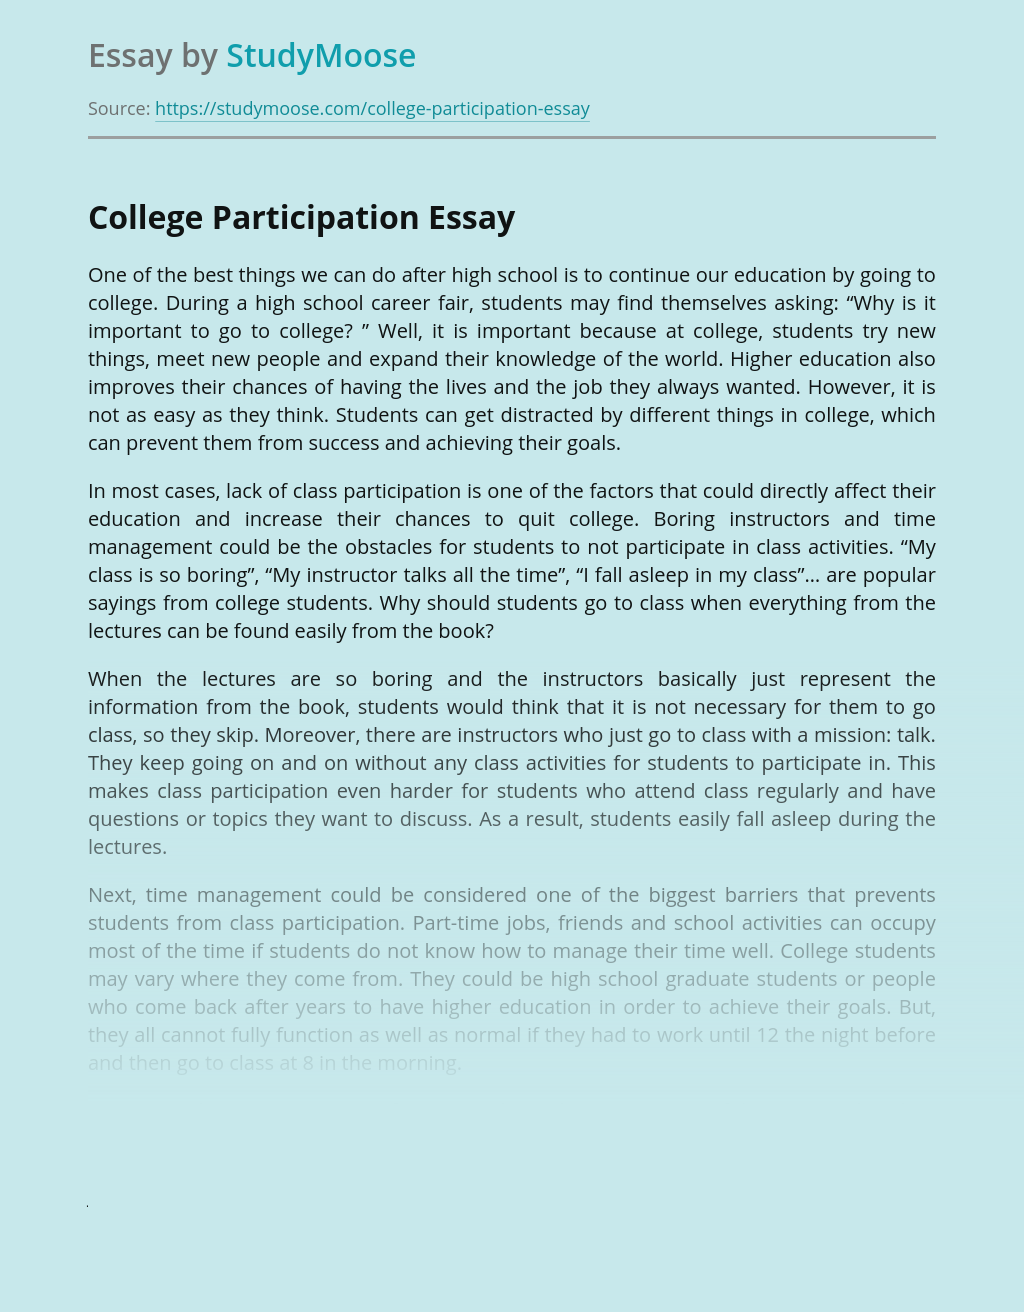 College Participation